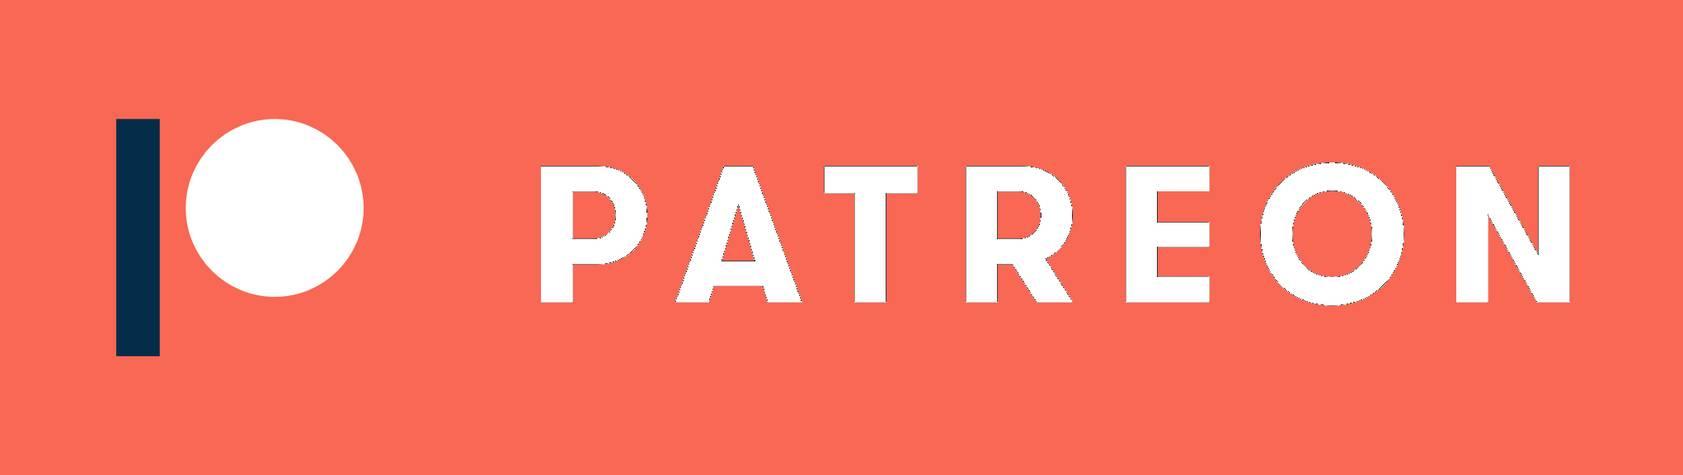 patreon_logo_by_laprasking_dbujg26-pre